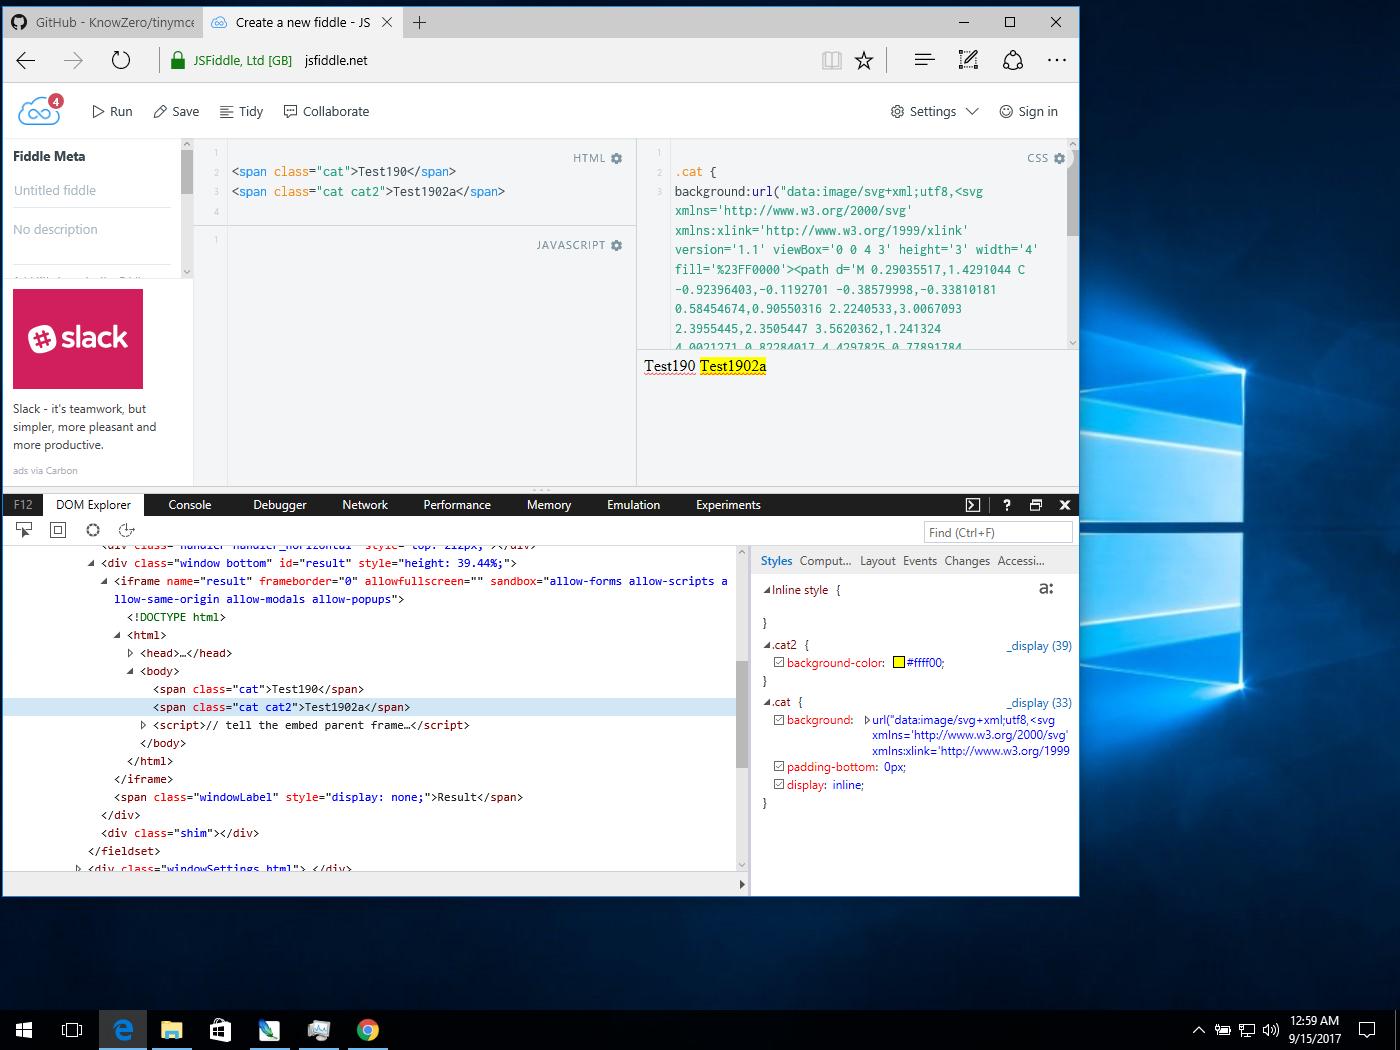 Plugin for Fidus Writer - Development - LanguageTool Forum